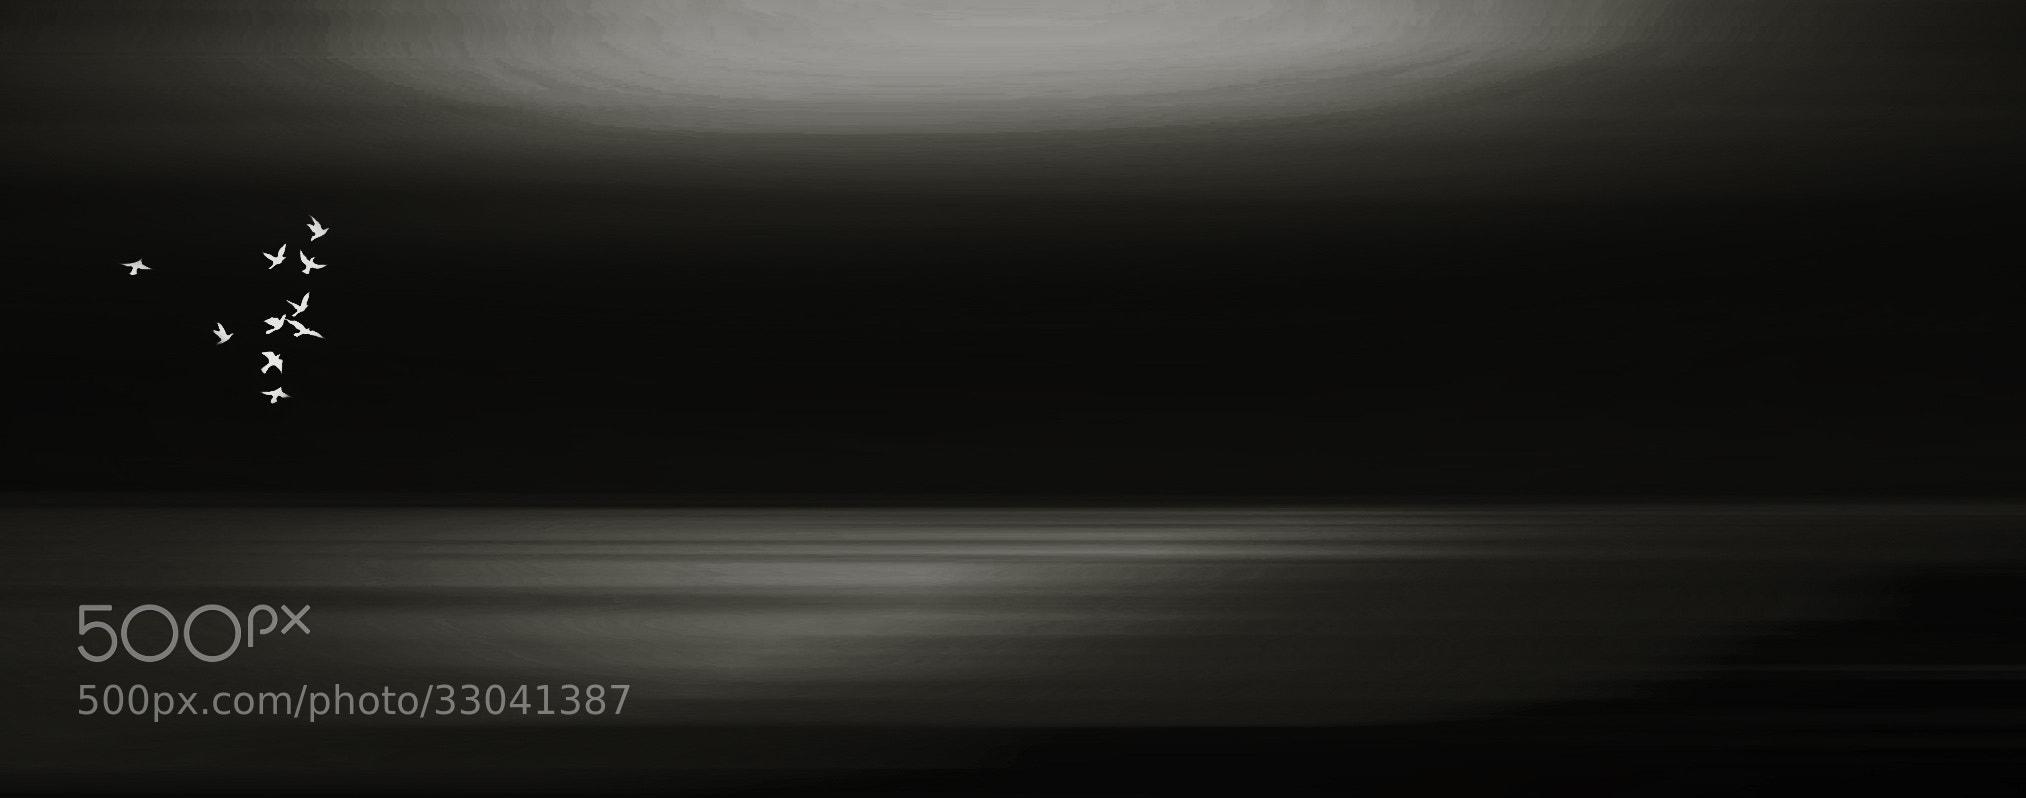 Photograph borderless by Sandra Sachsenhauser on 500px